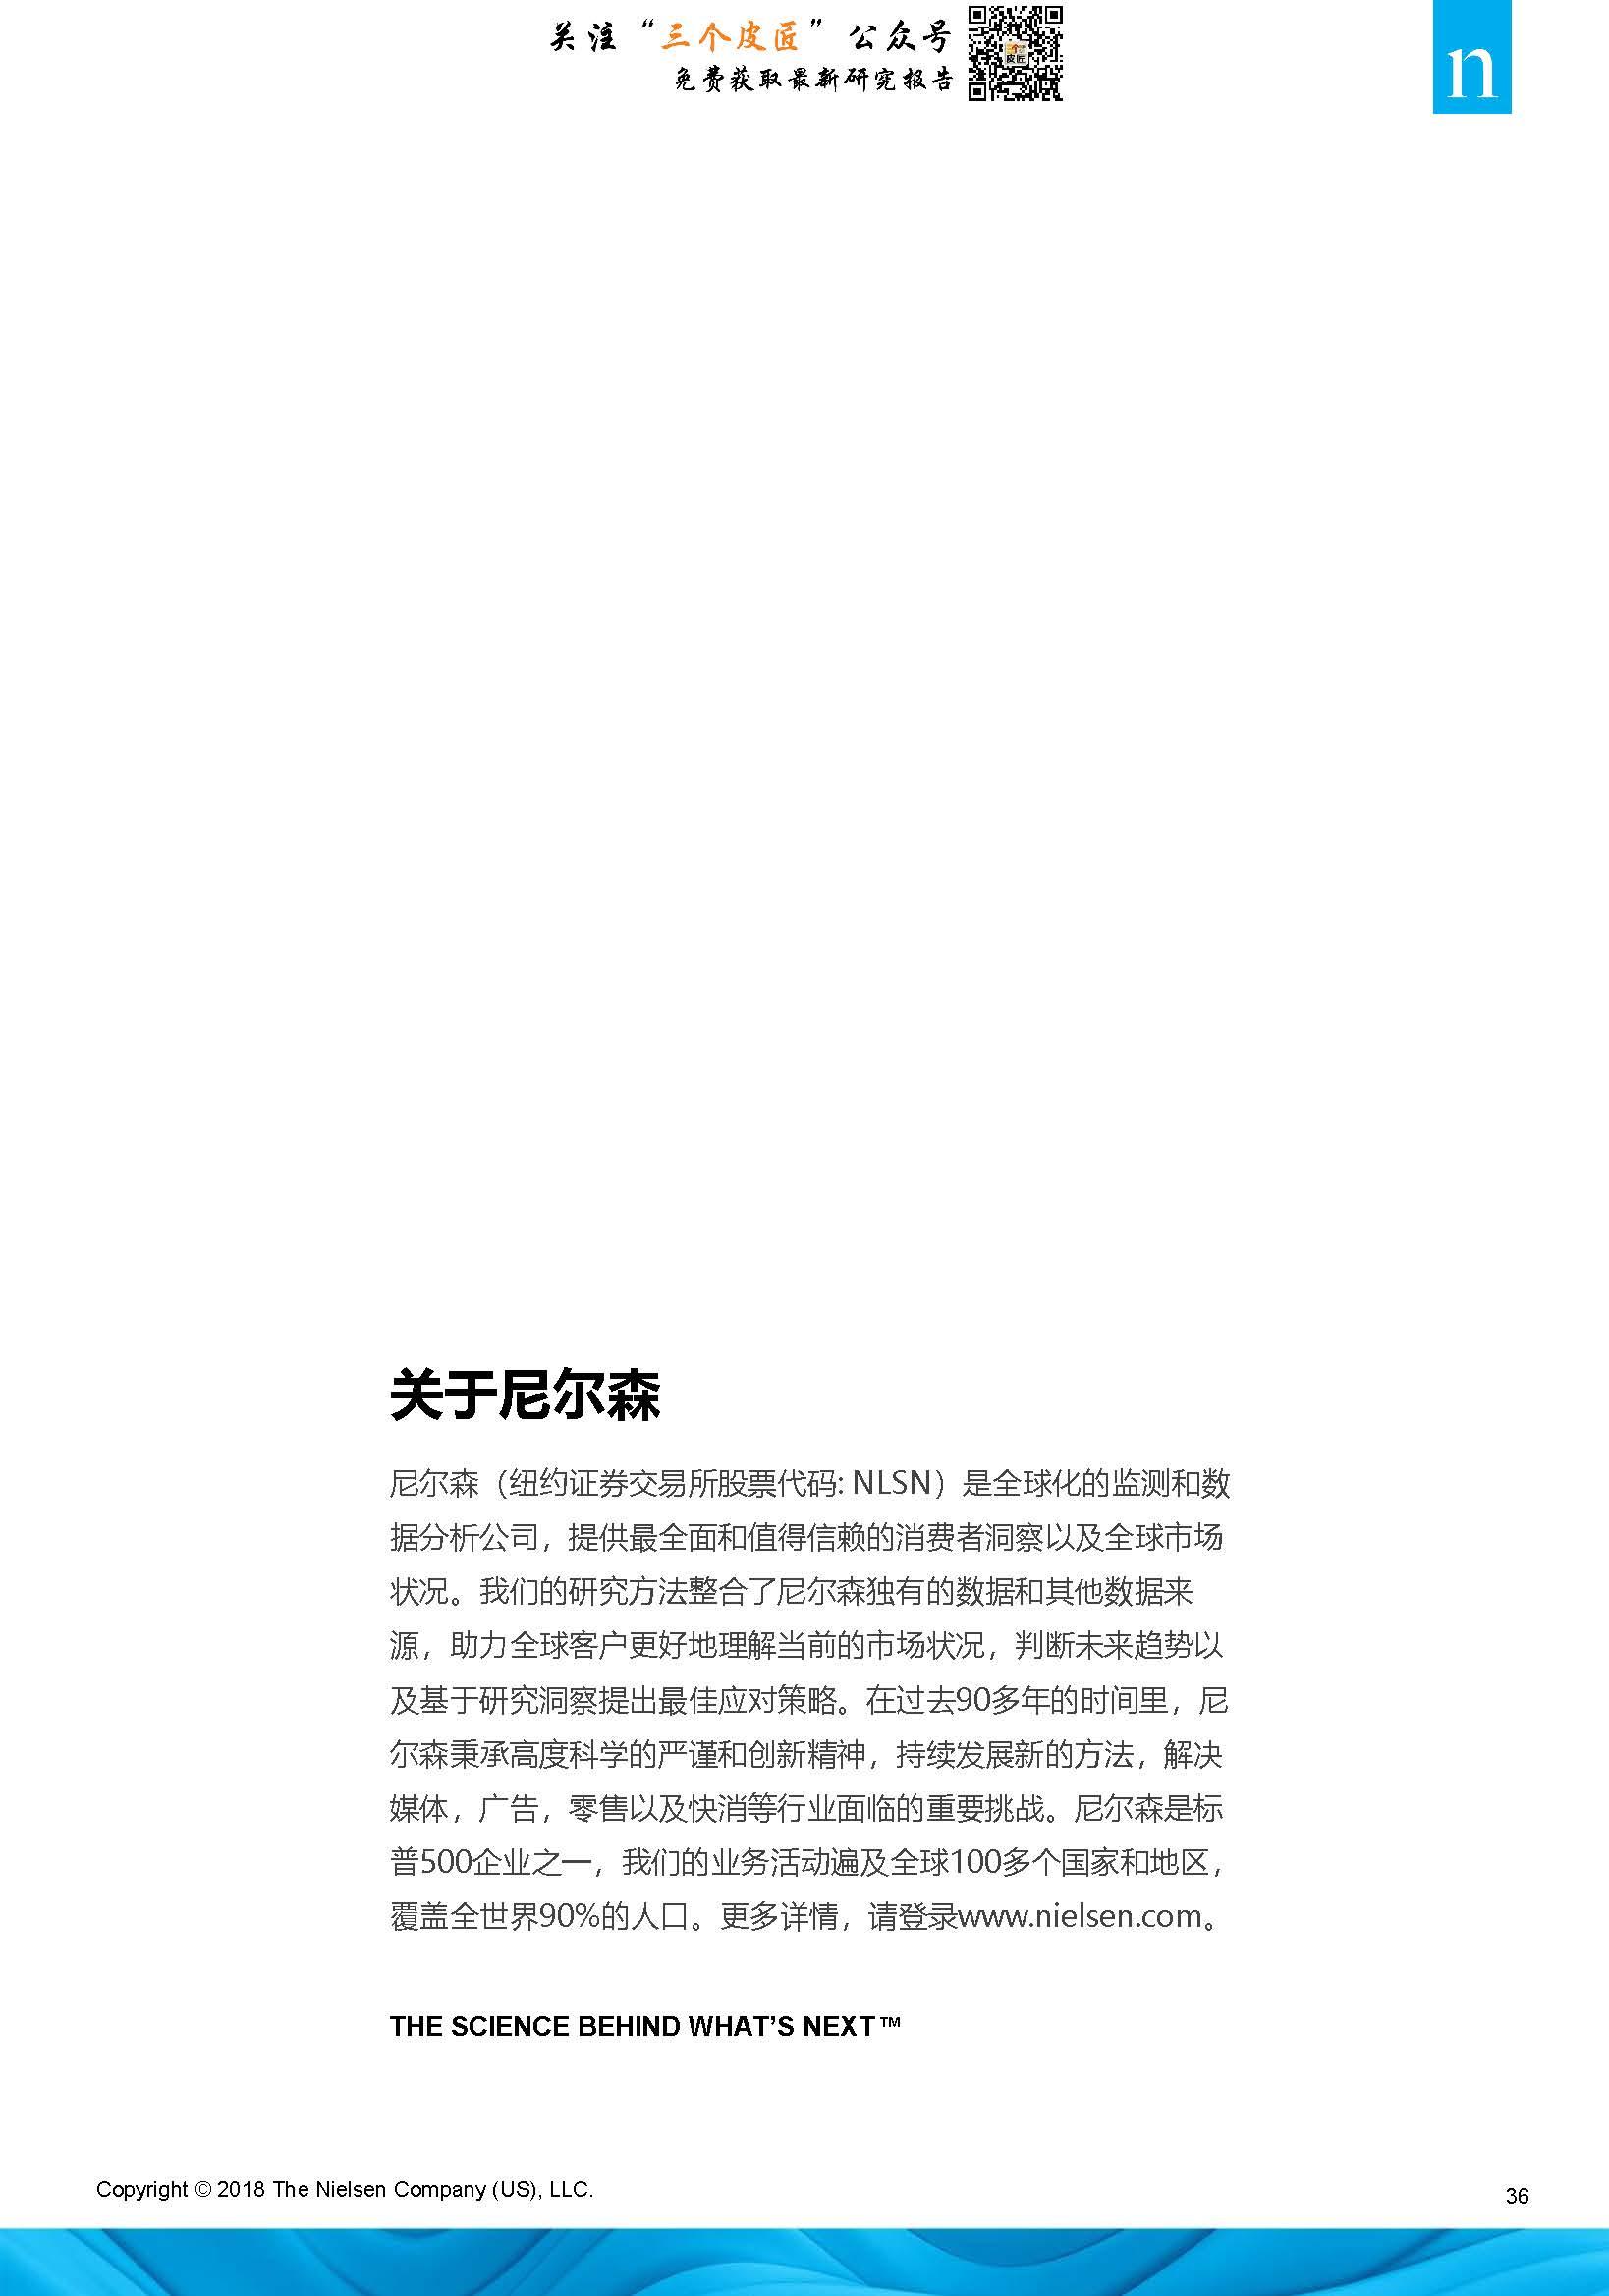 1_Page_36.jpg